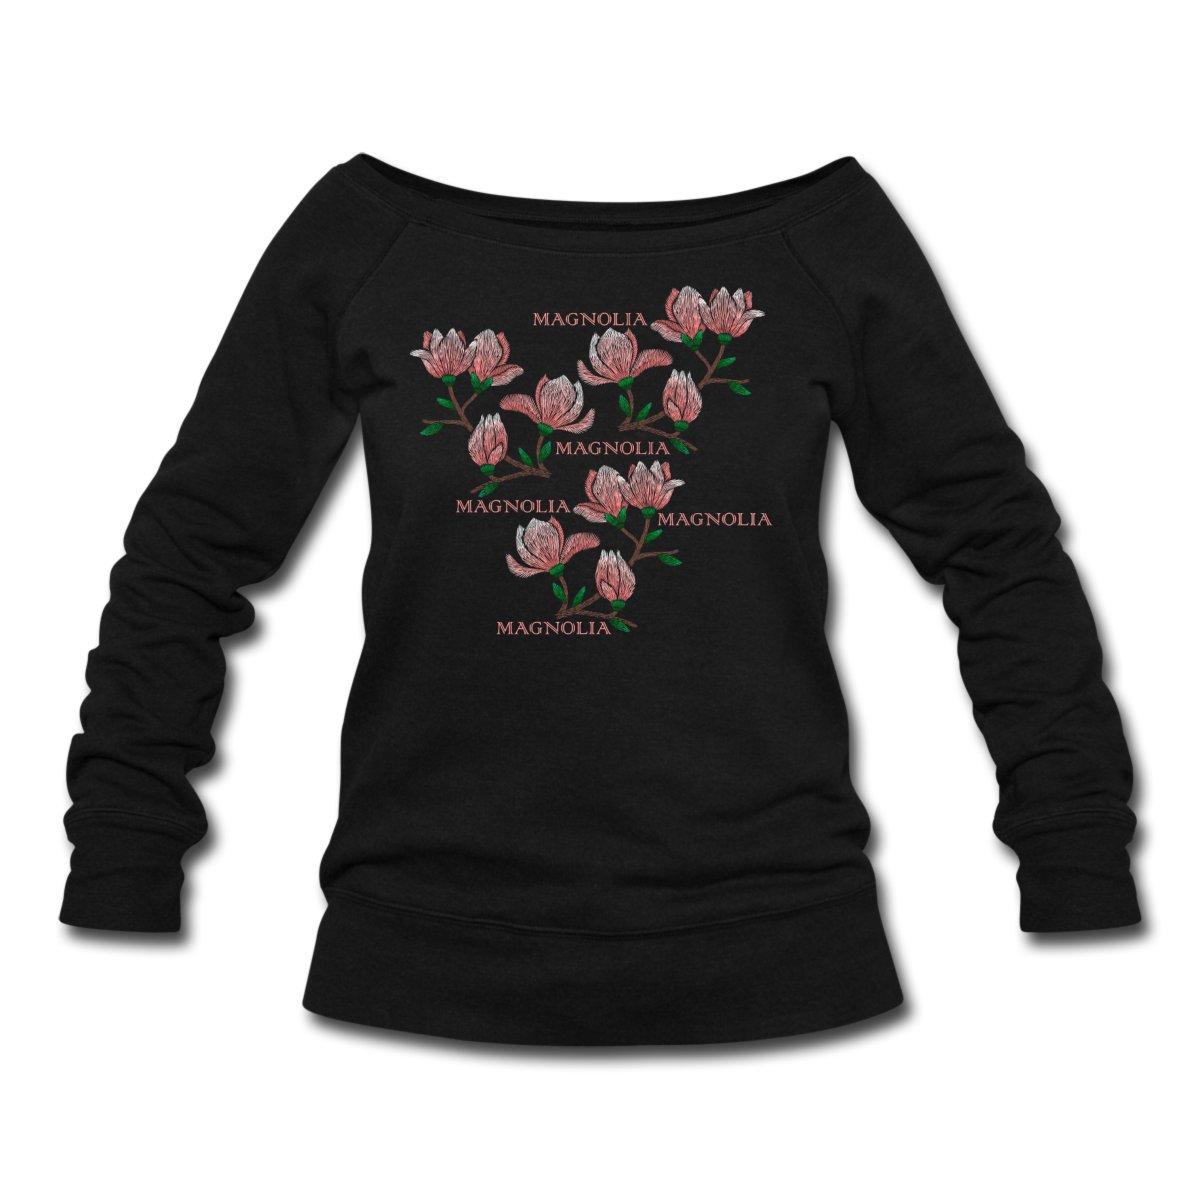 magnolia-laangaermad-troeja-med-baatringning-dam-fraan-bella-svart.jpg